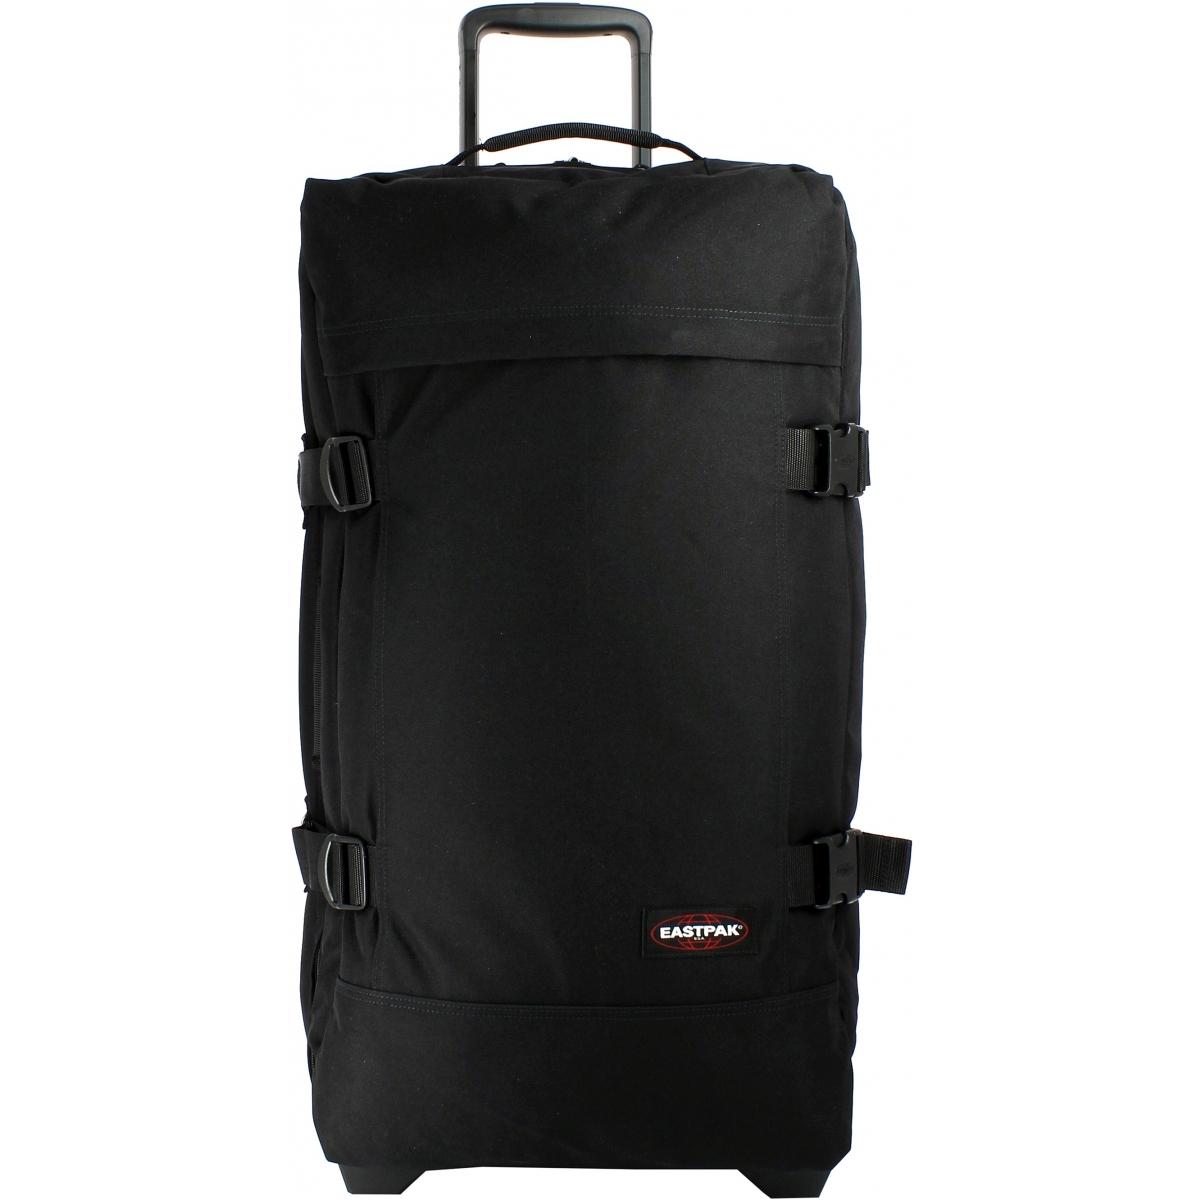 sac de voyage roulettes taille l eastpak ek63f008 couleur principale 008 black. Black Bedroom Furniture Sets. Home Design Ideas